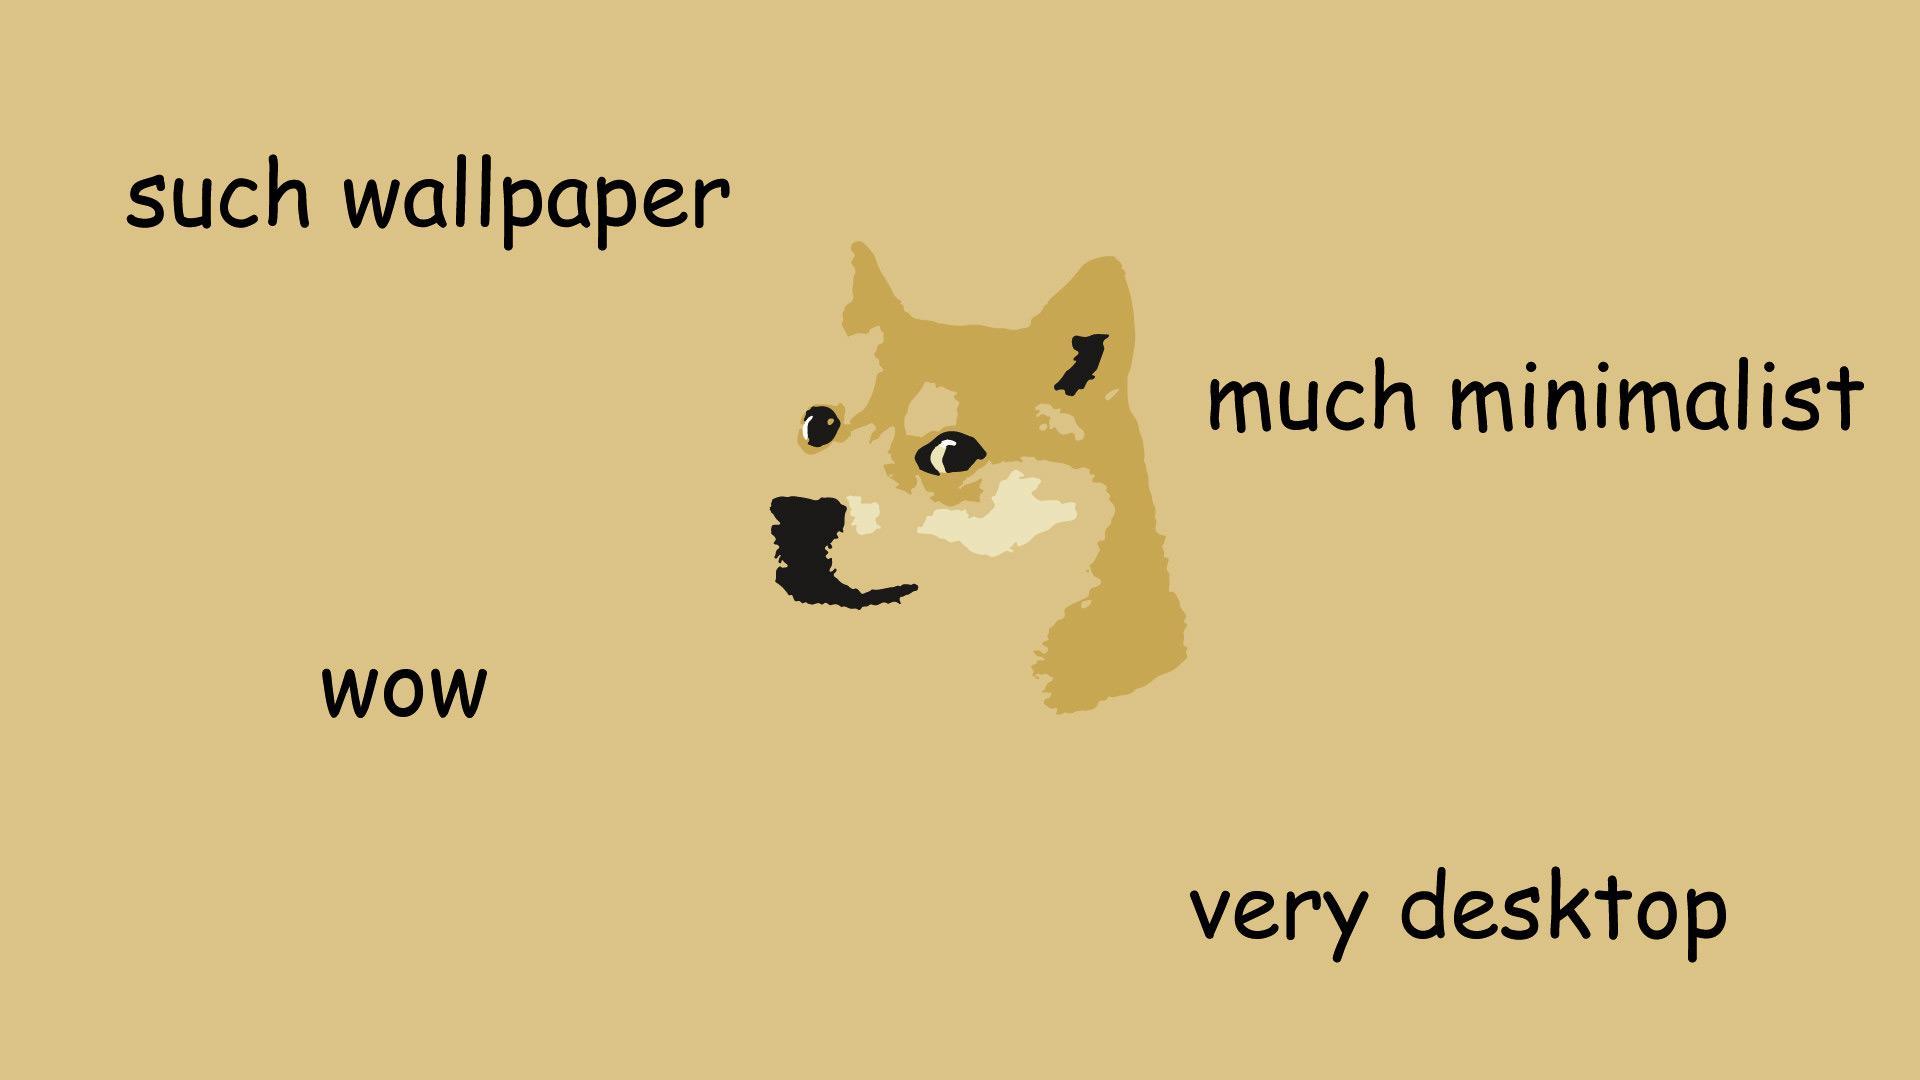 Good Meme For Desktop Background Of The Week Probably Not Gonna